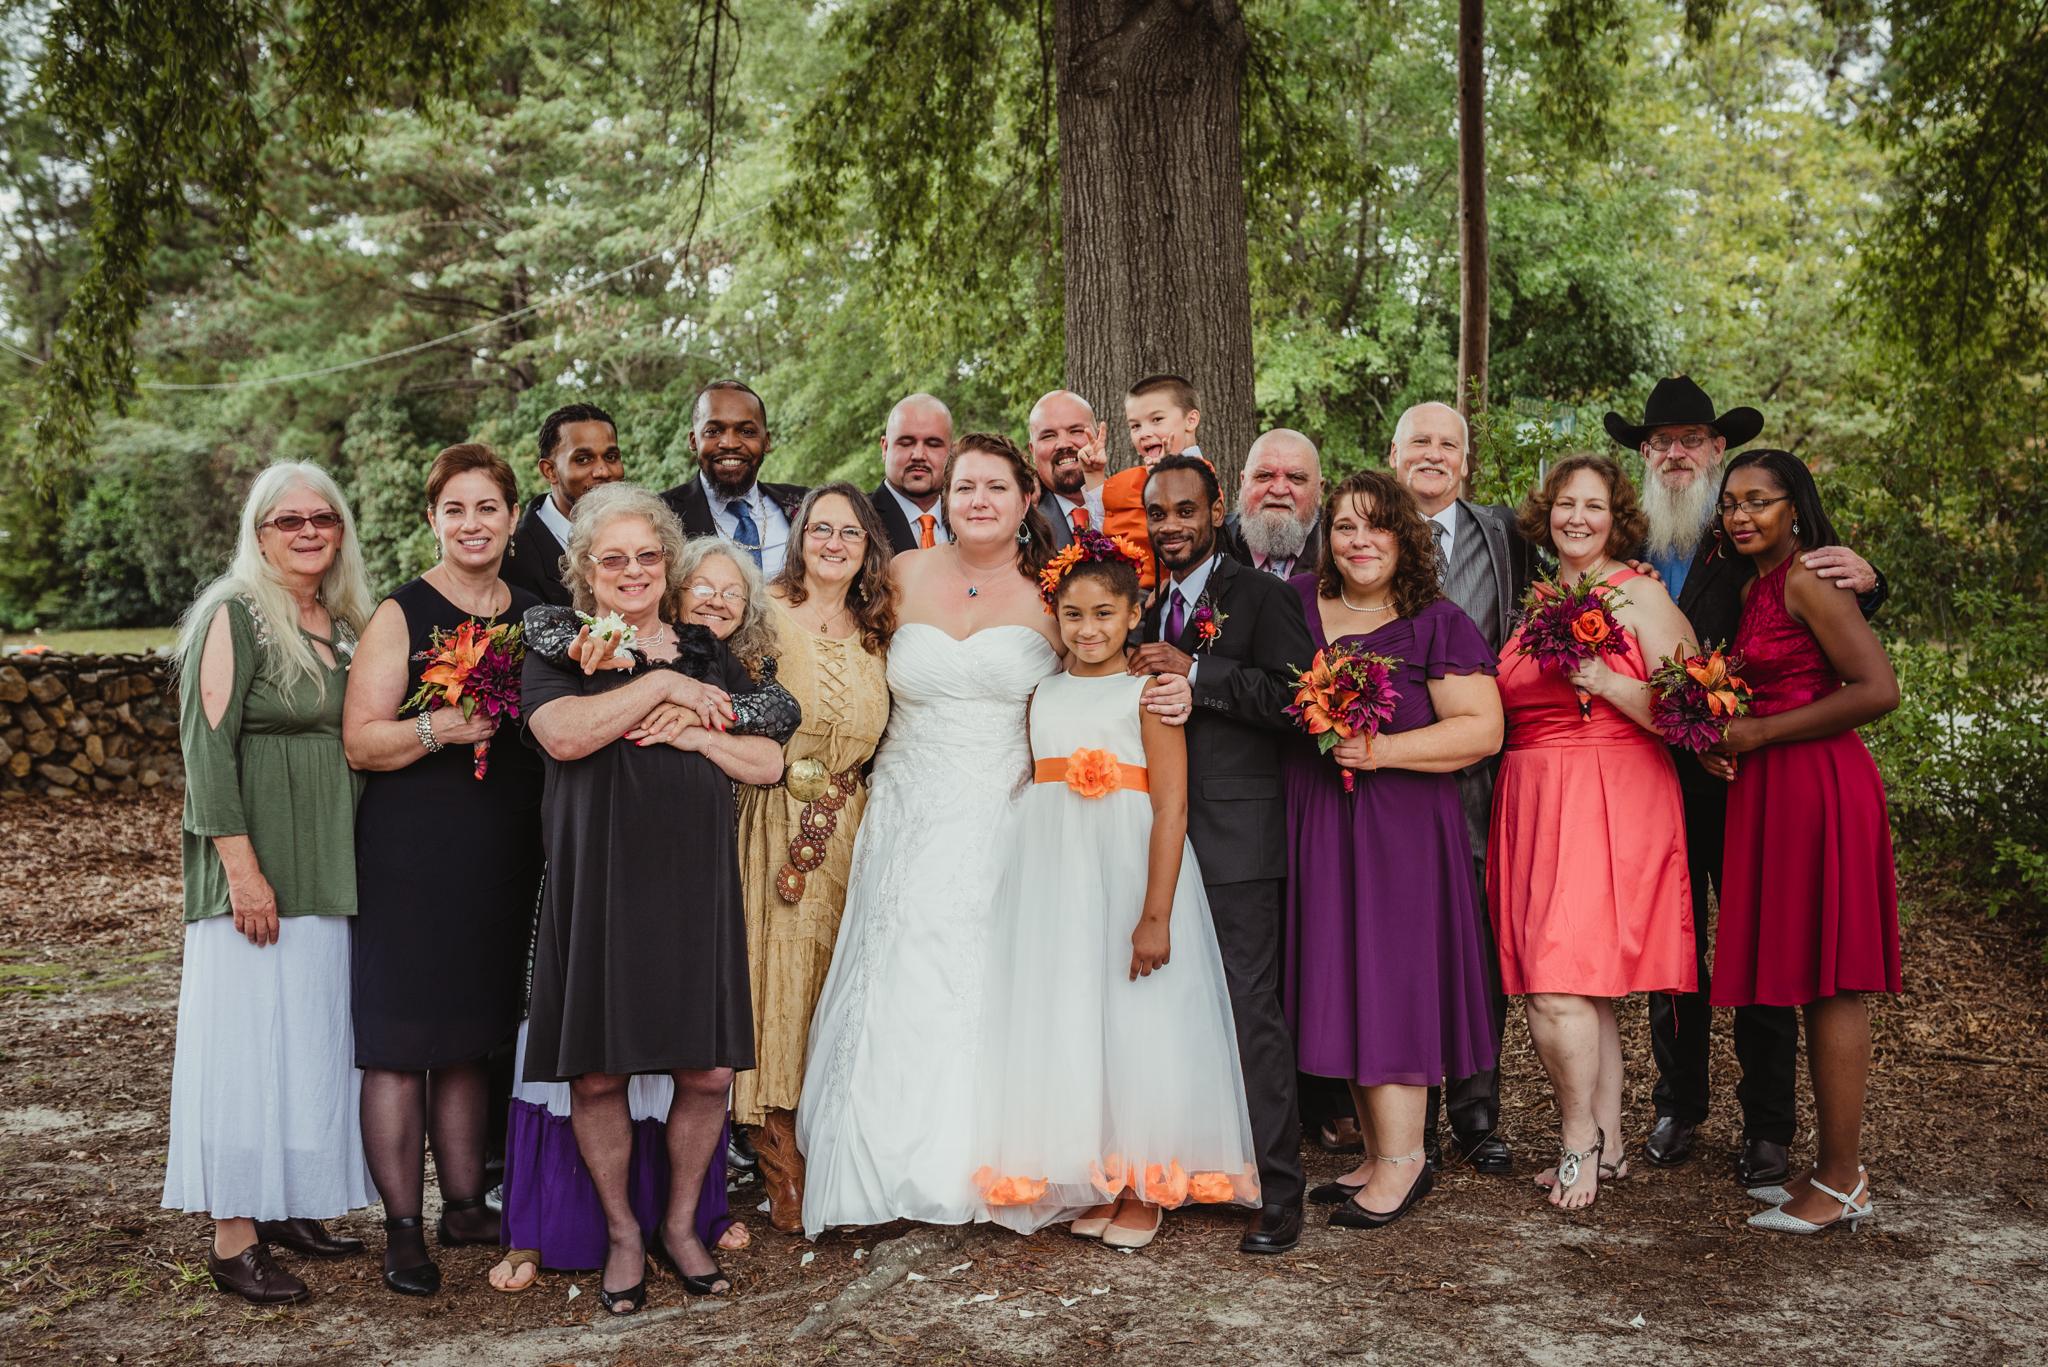 raleigh-wedding-family-portraits-cd.jpg